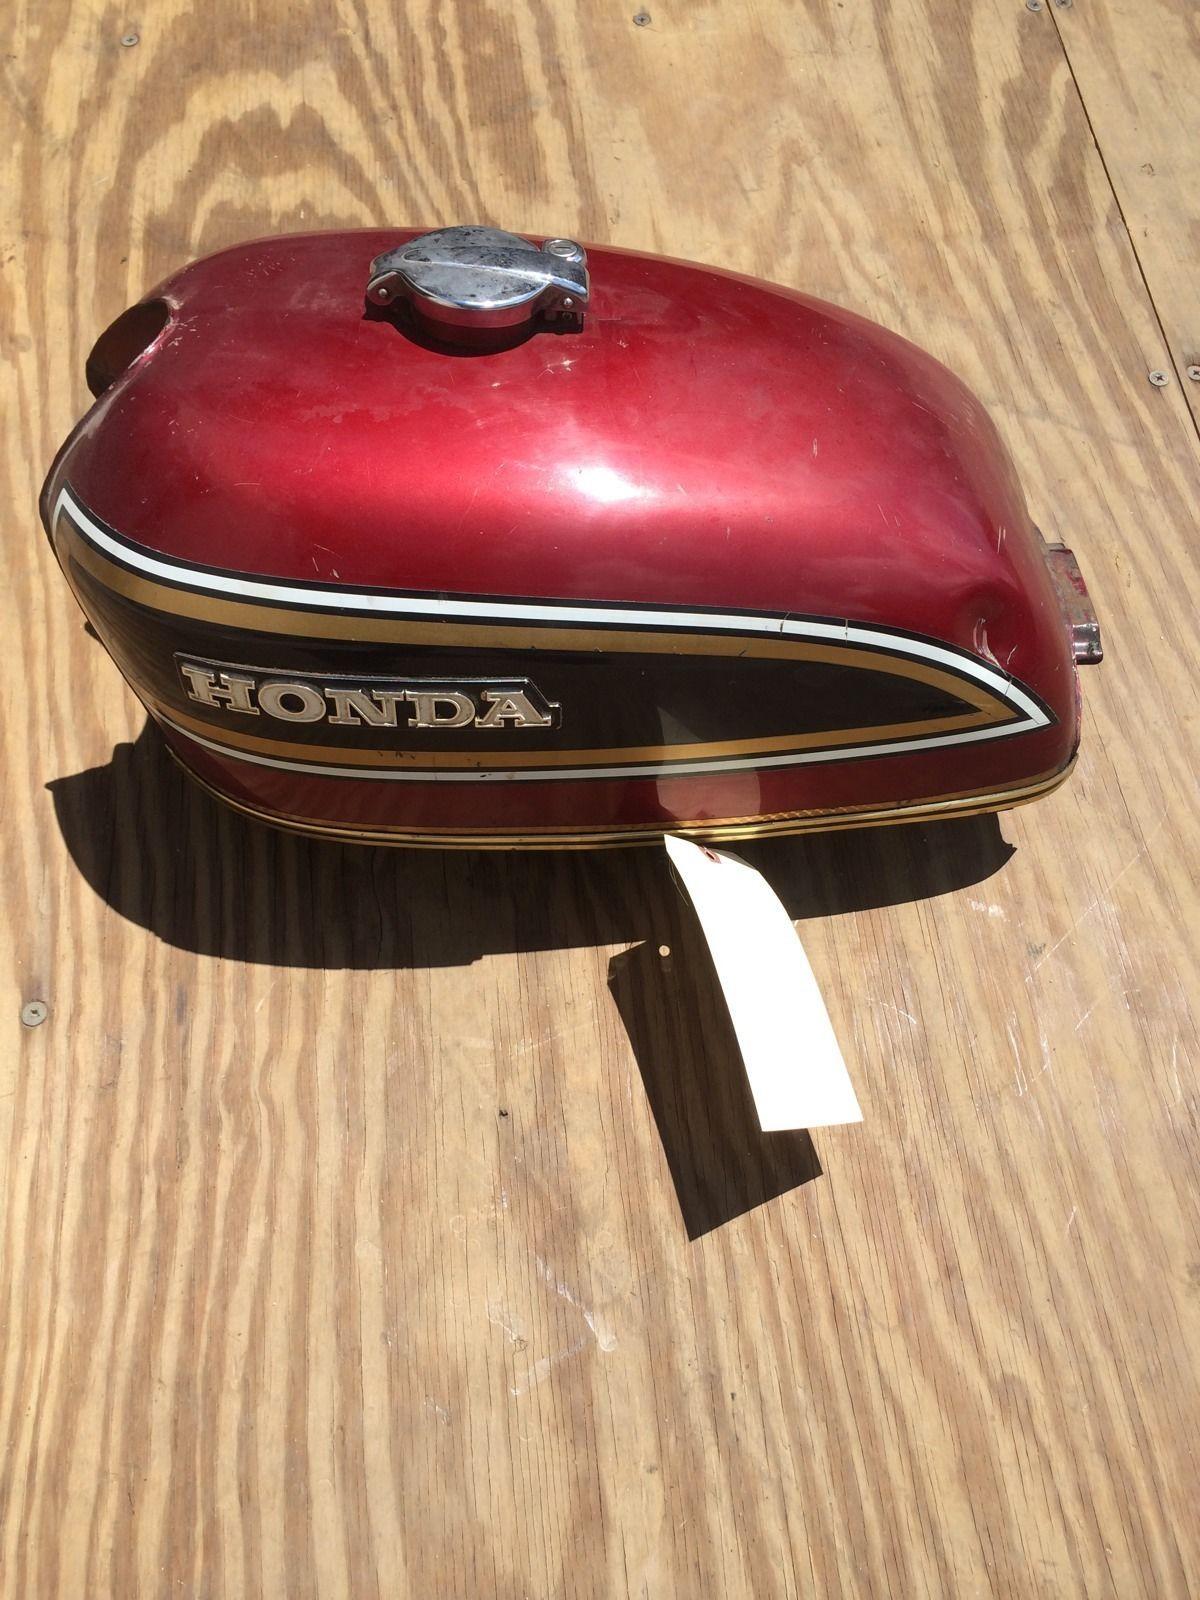 Vintage Honda Cb750k Motorcycle Fuel Gas Tank Fuel Gas Gas Tanks Motorcycle